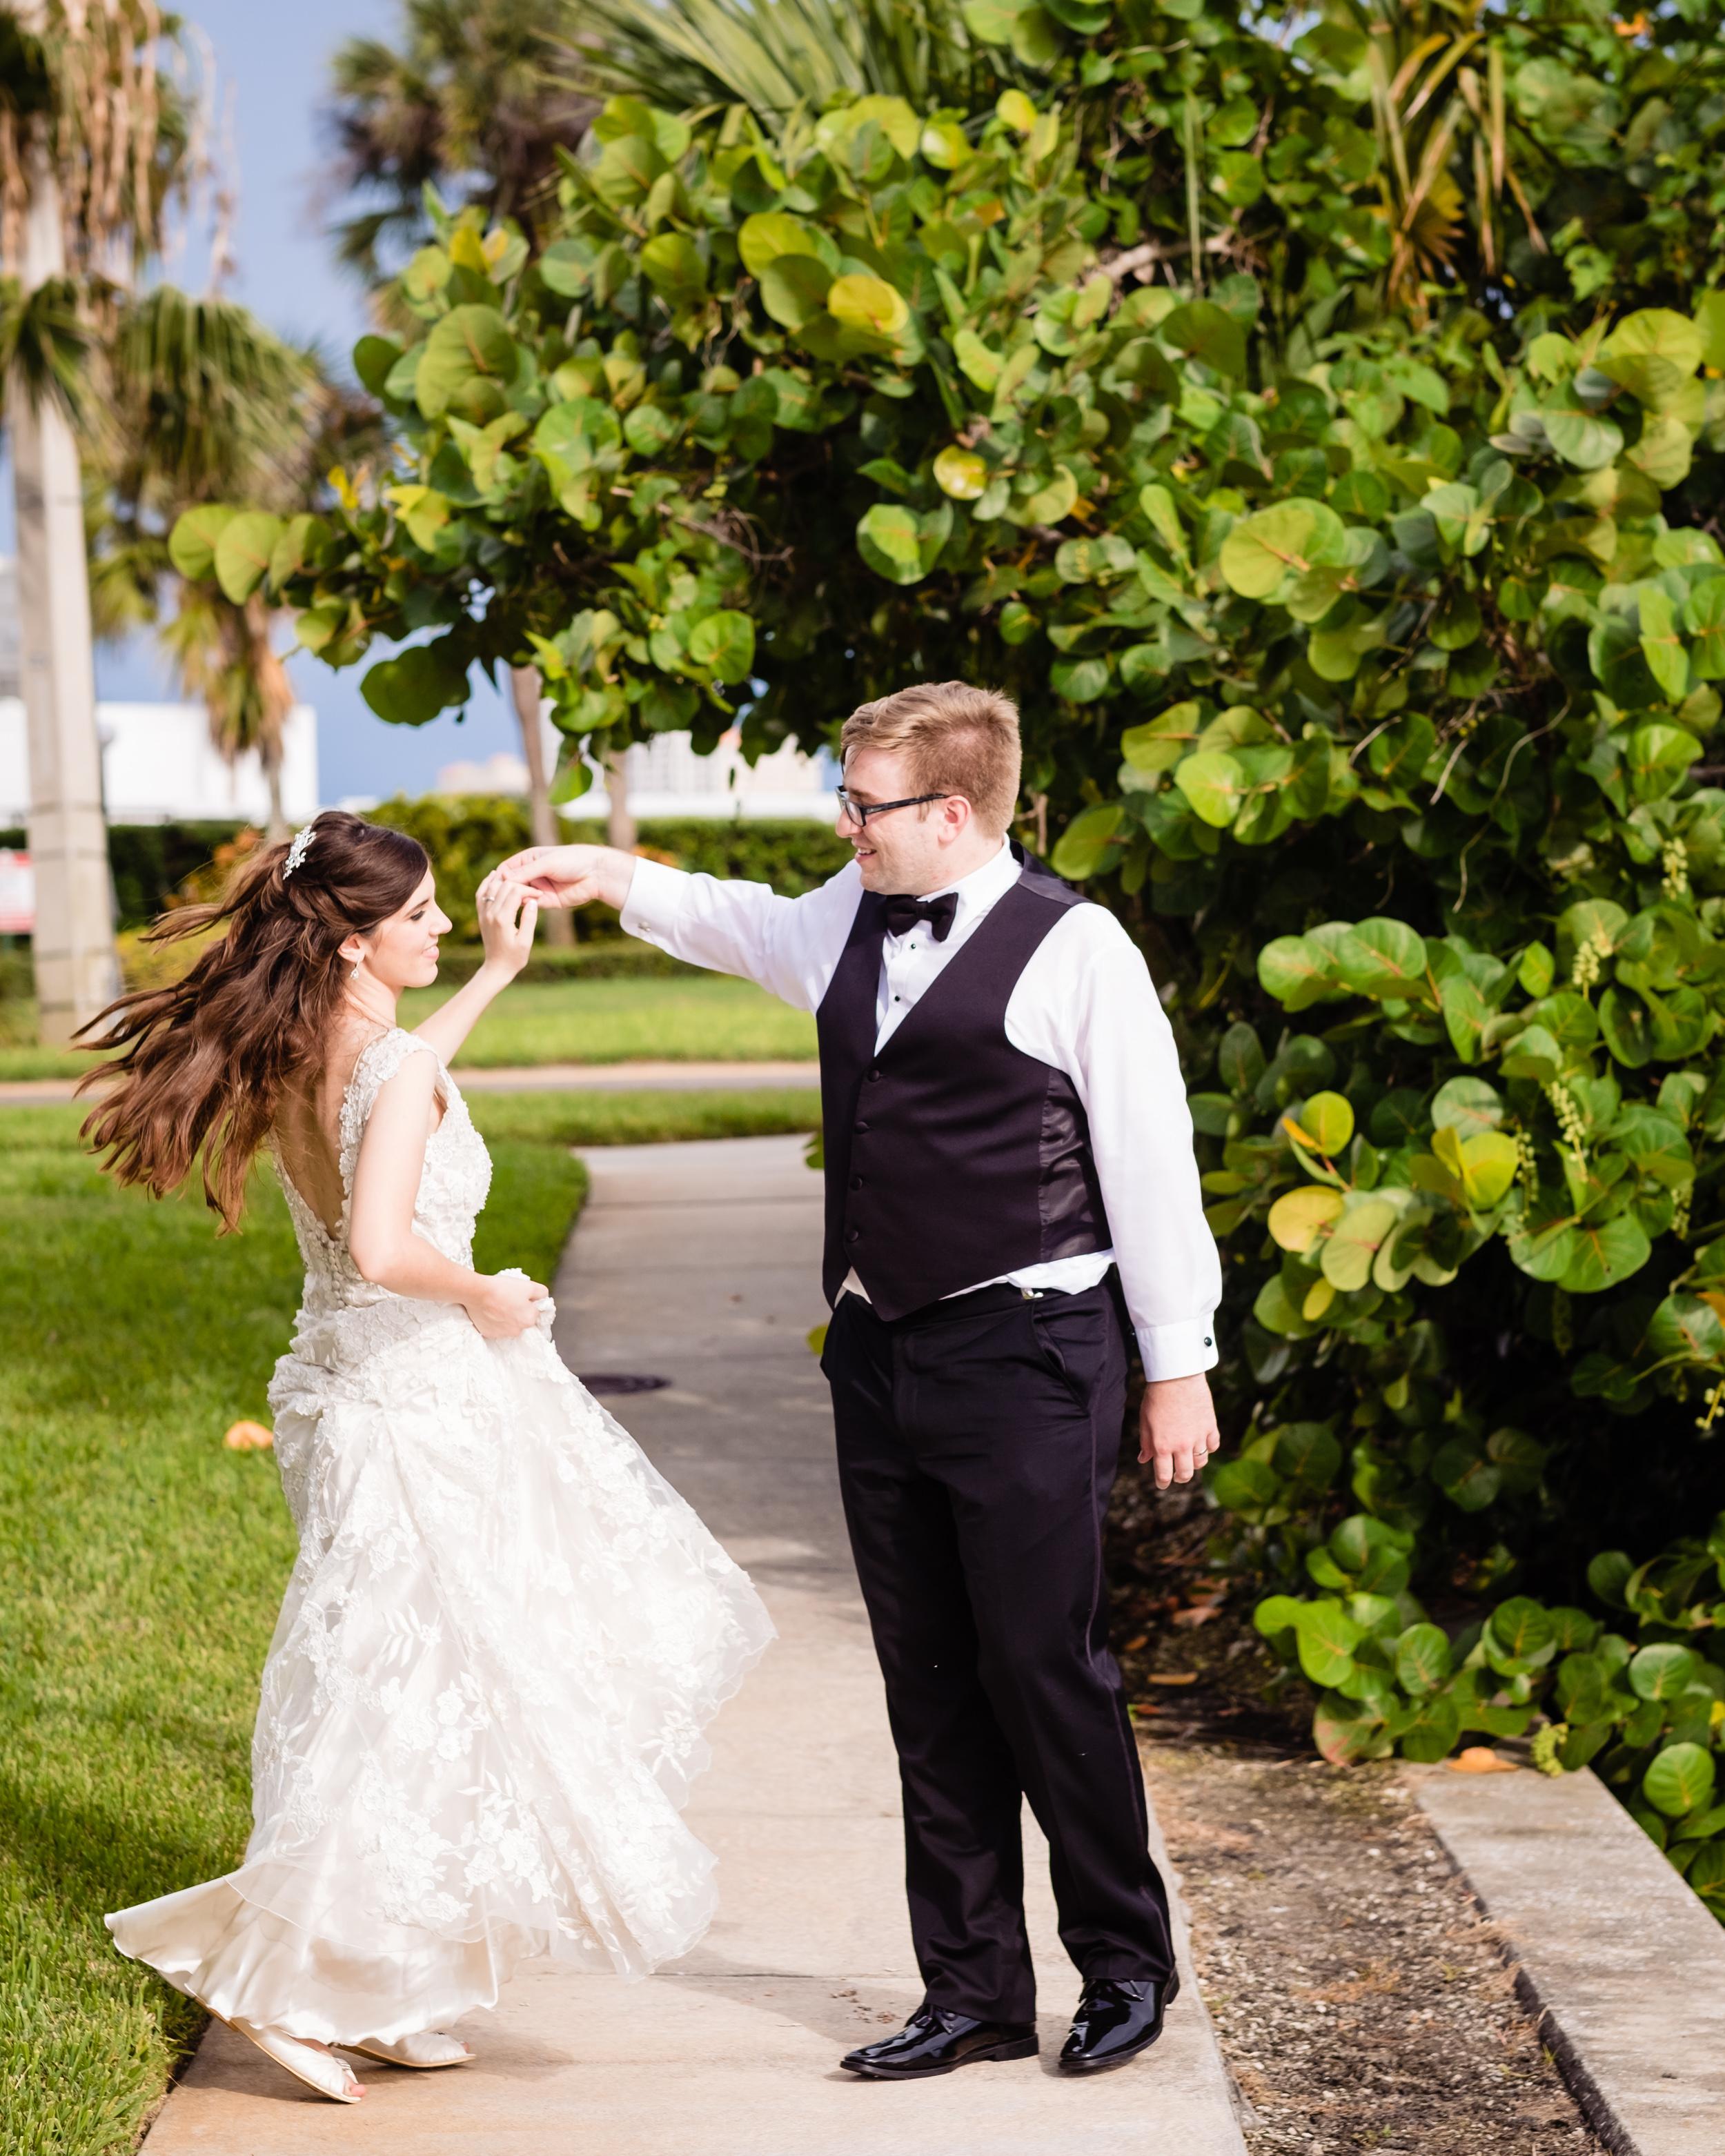 HAH_Zoe and Daniel_Clearwater Wedding_623_2018.jpg